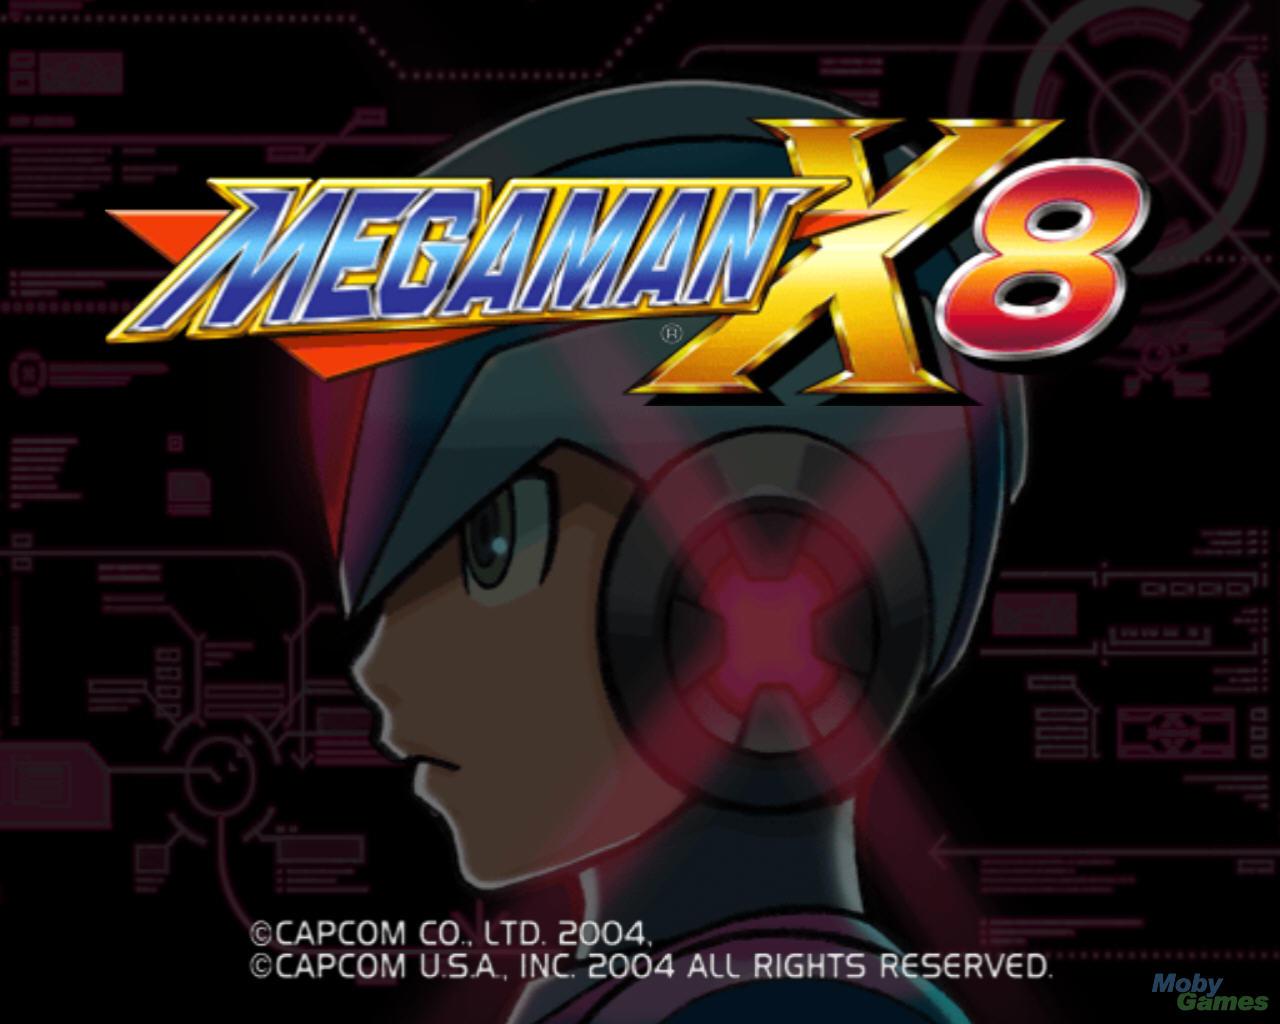 mega-man-x8-jogo-chegara-ao-playstation-network-nessa-semana